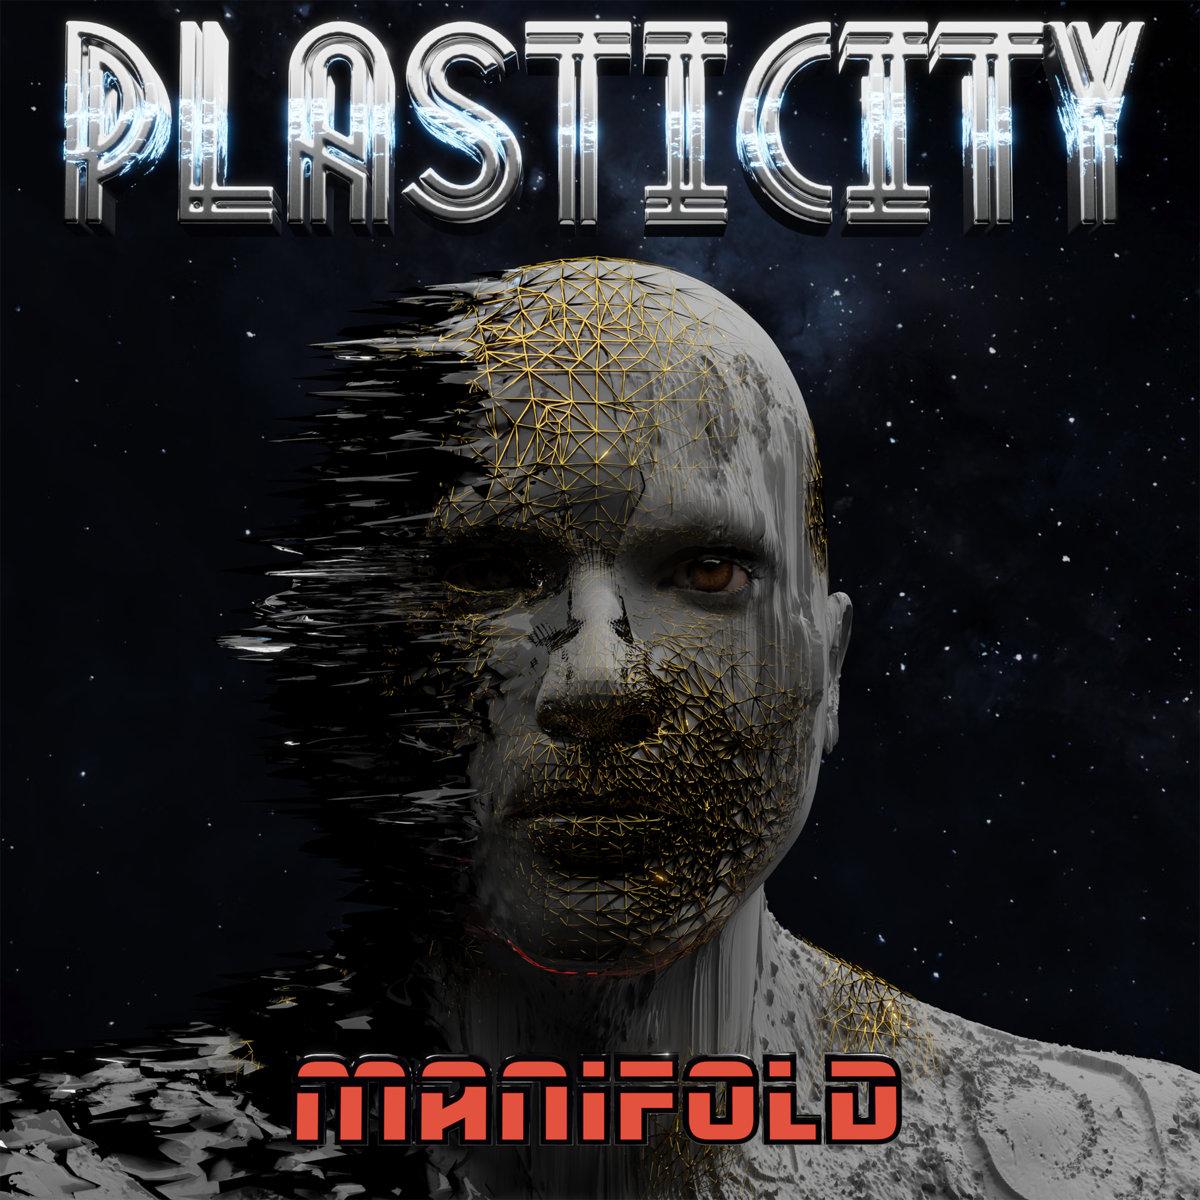 Manifold by Plasticity